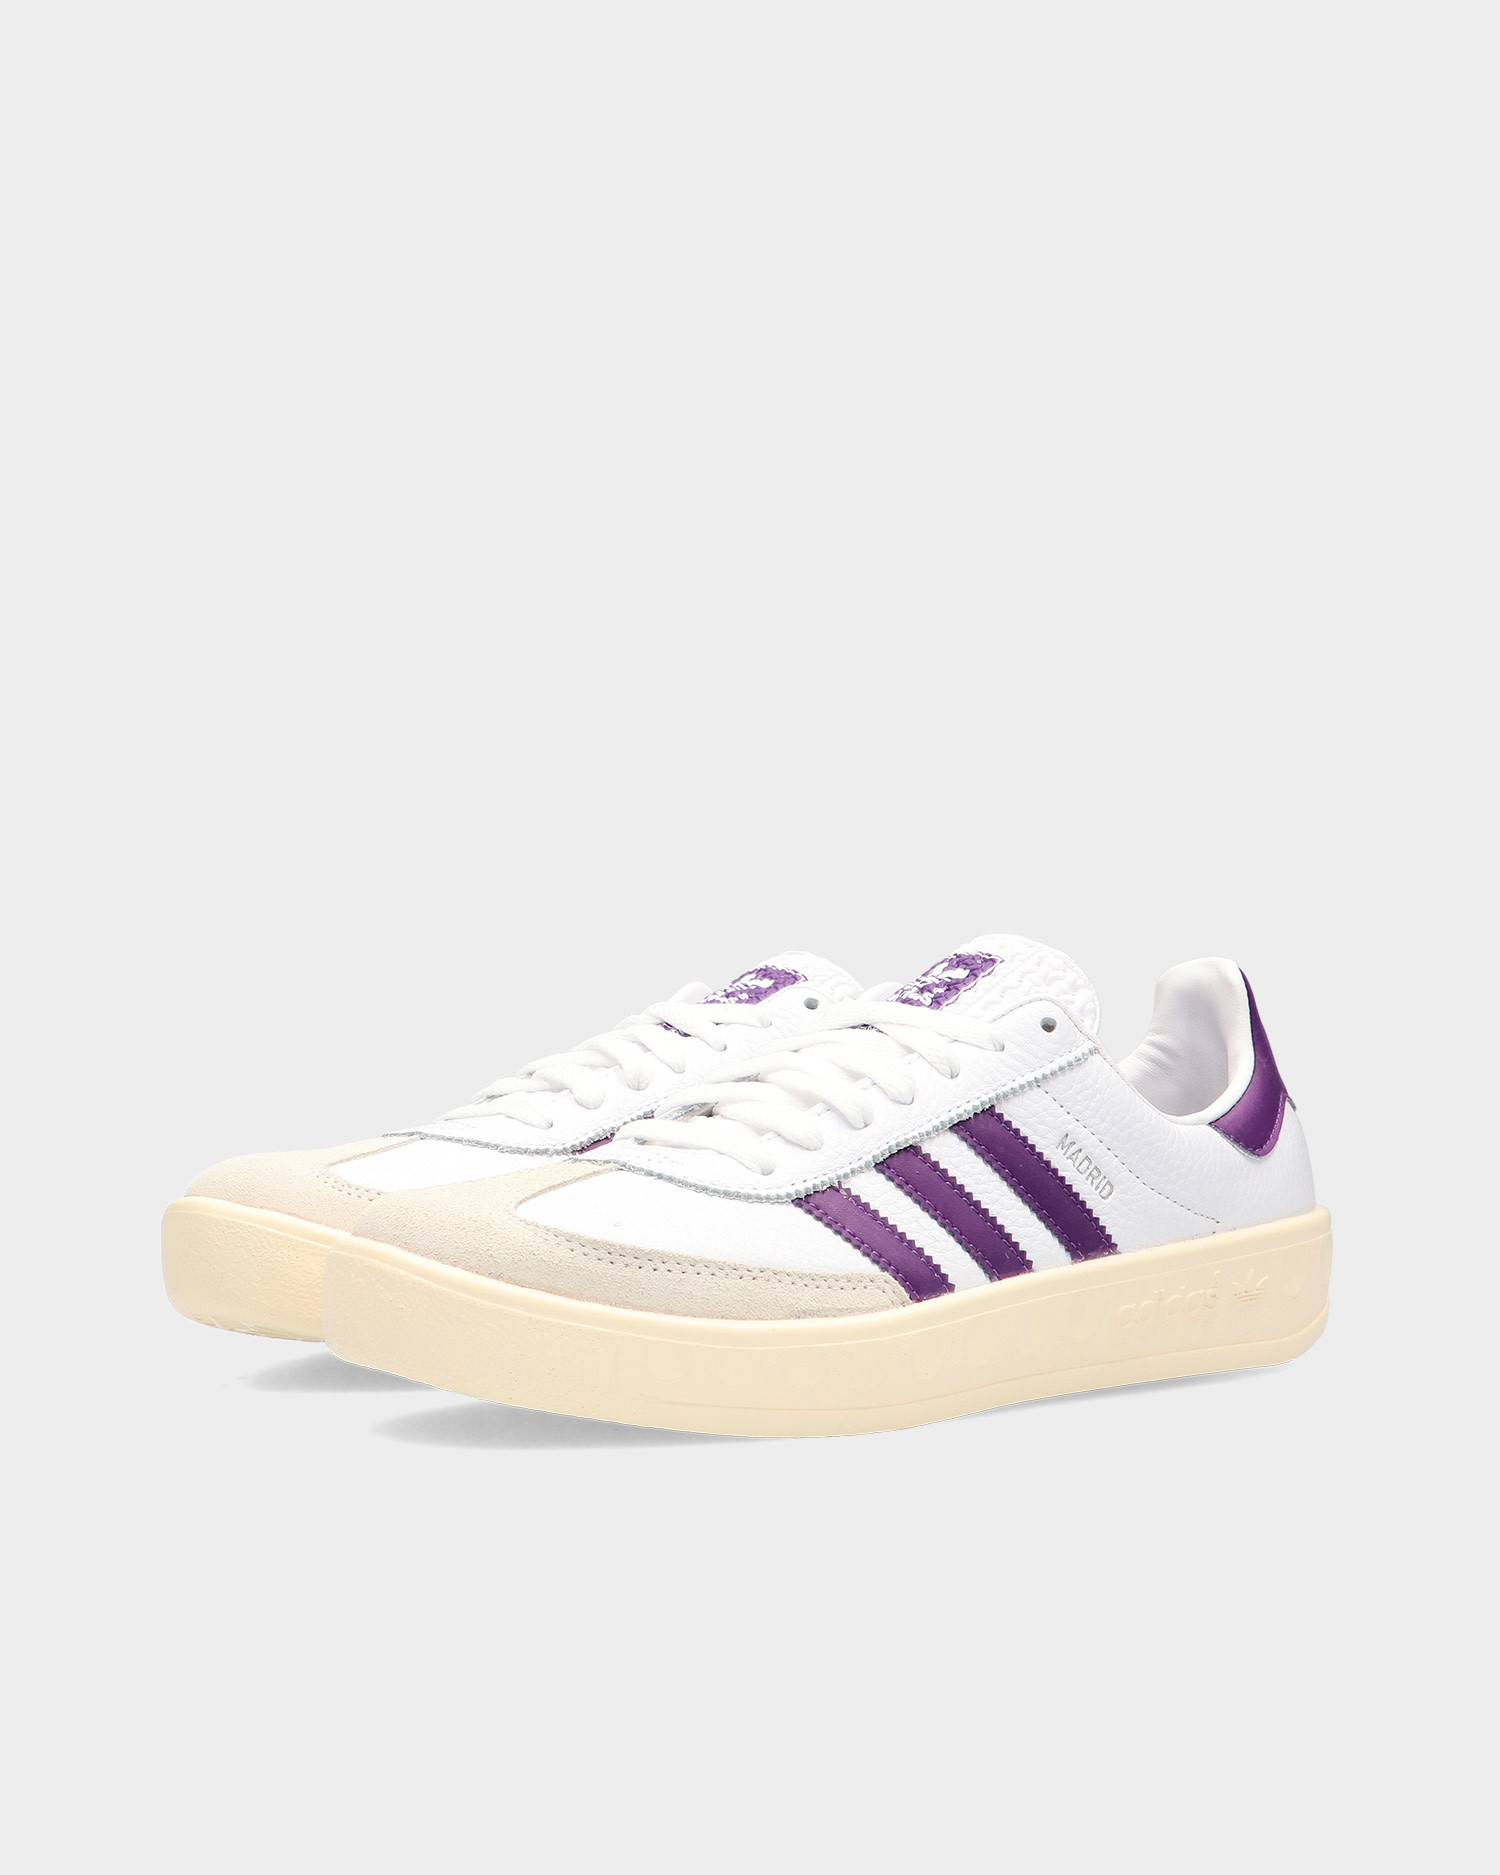 Adidas Madrid Ftwwht/Shopur/Cwhite